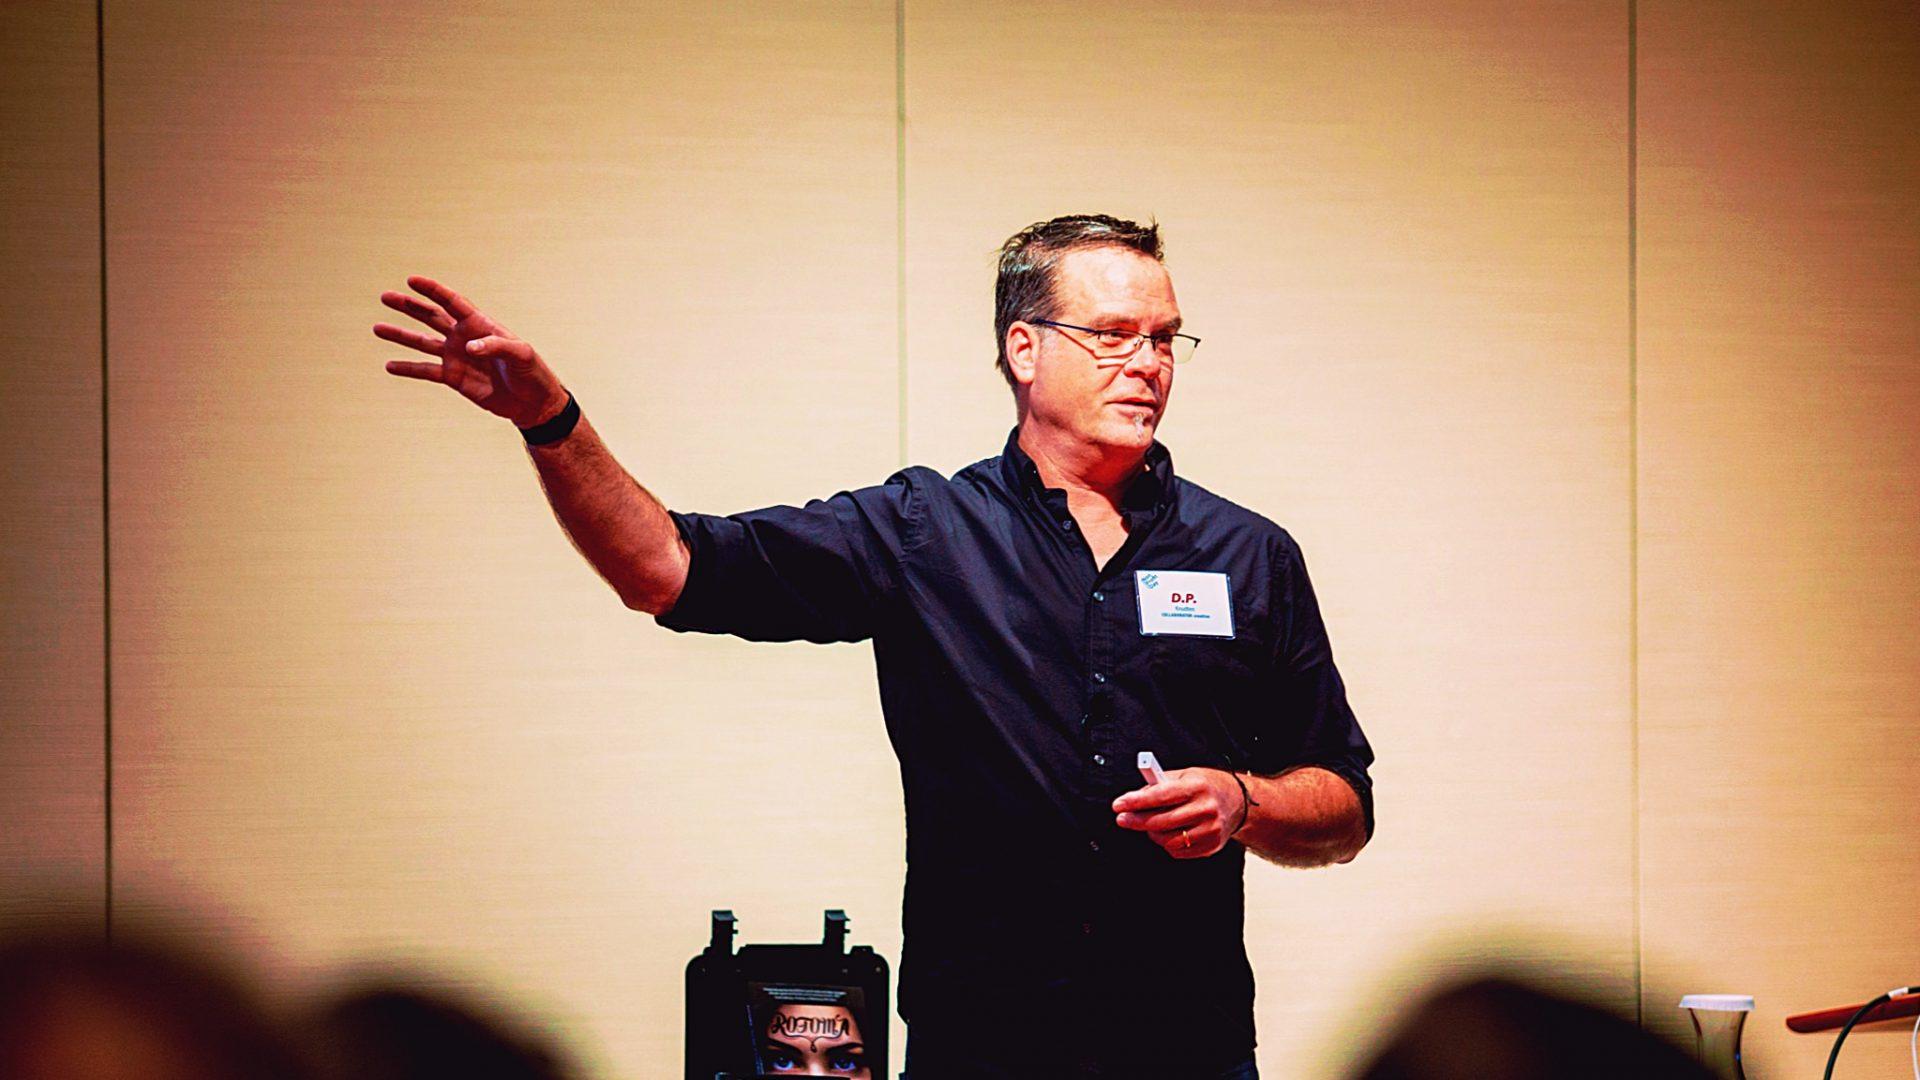 D.P. KNUDTEN • COLLABORATOR creative • Keynote Speaker / Author